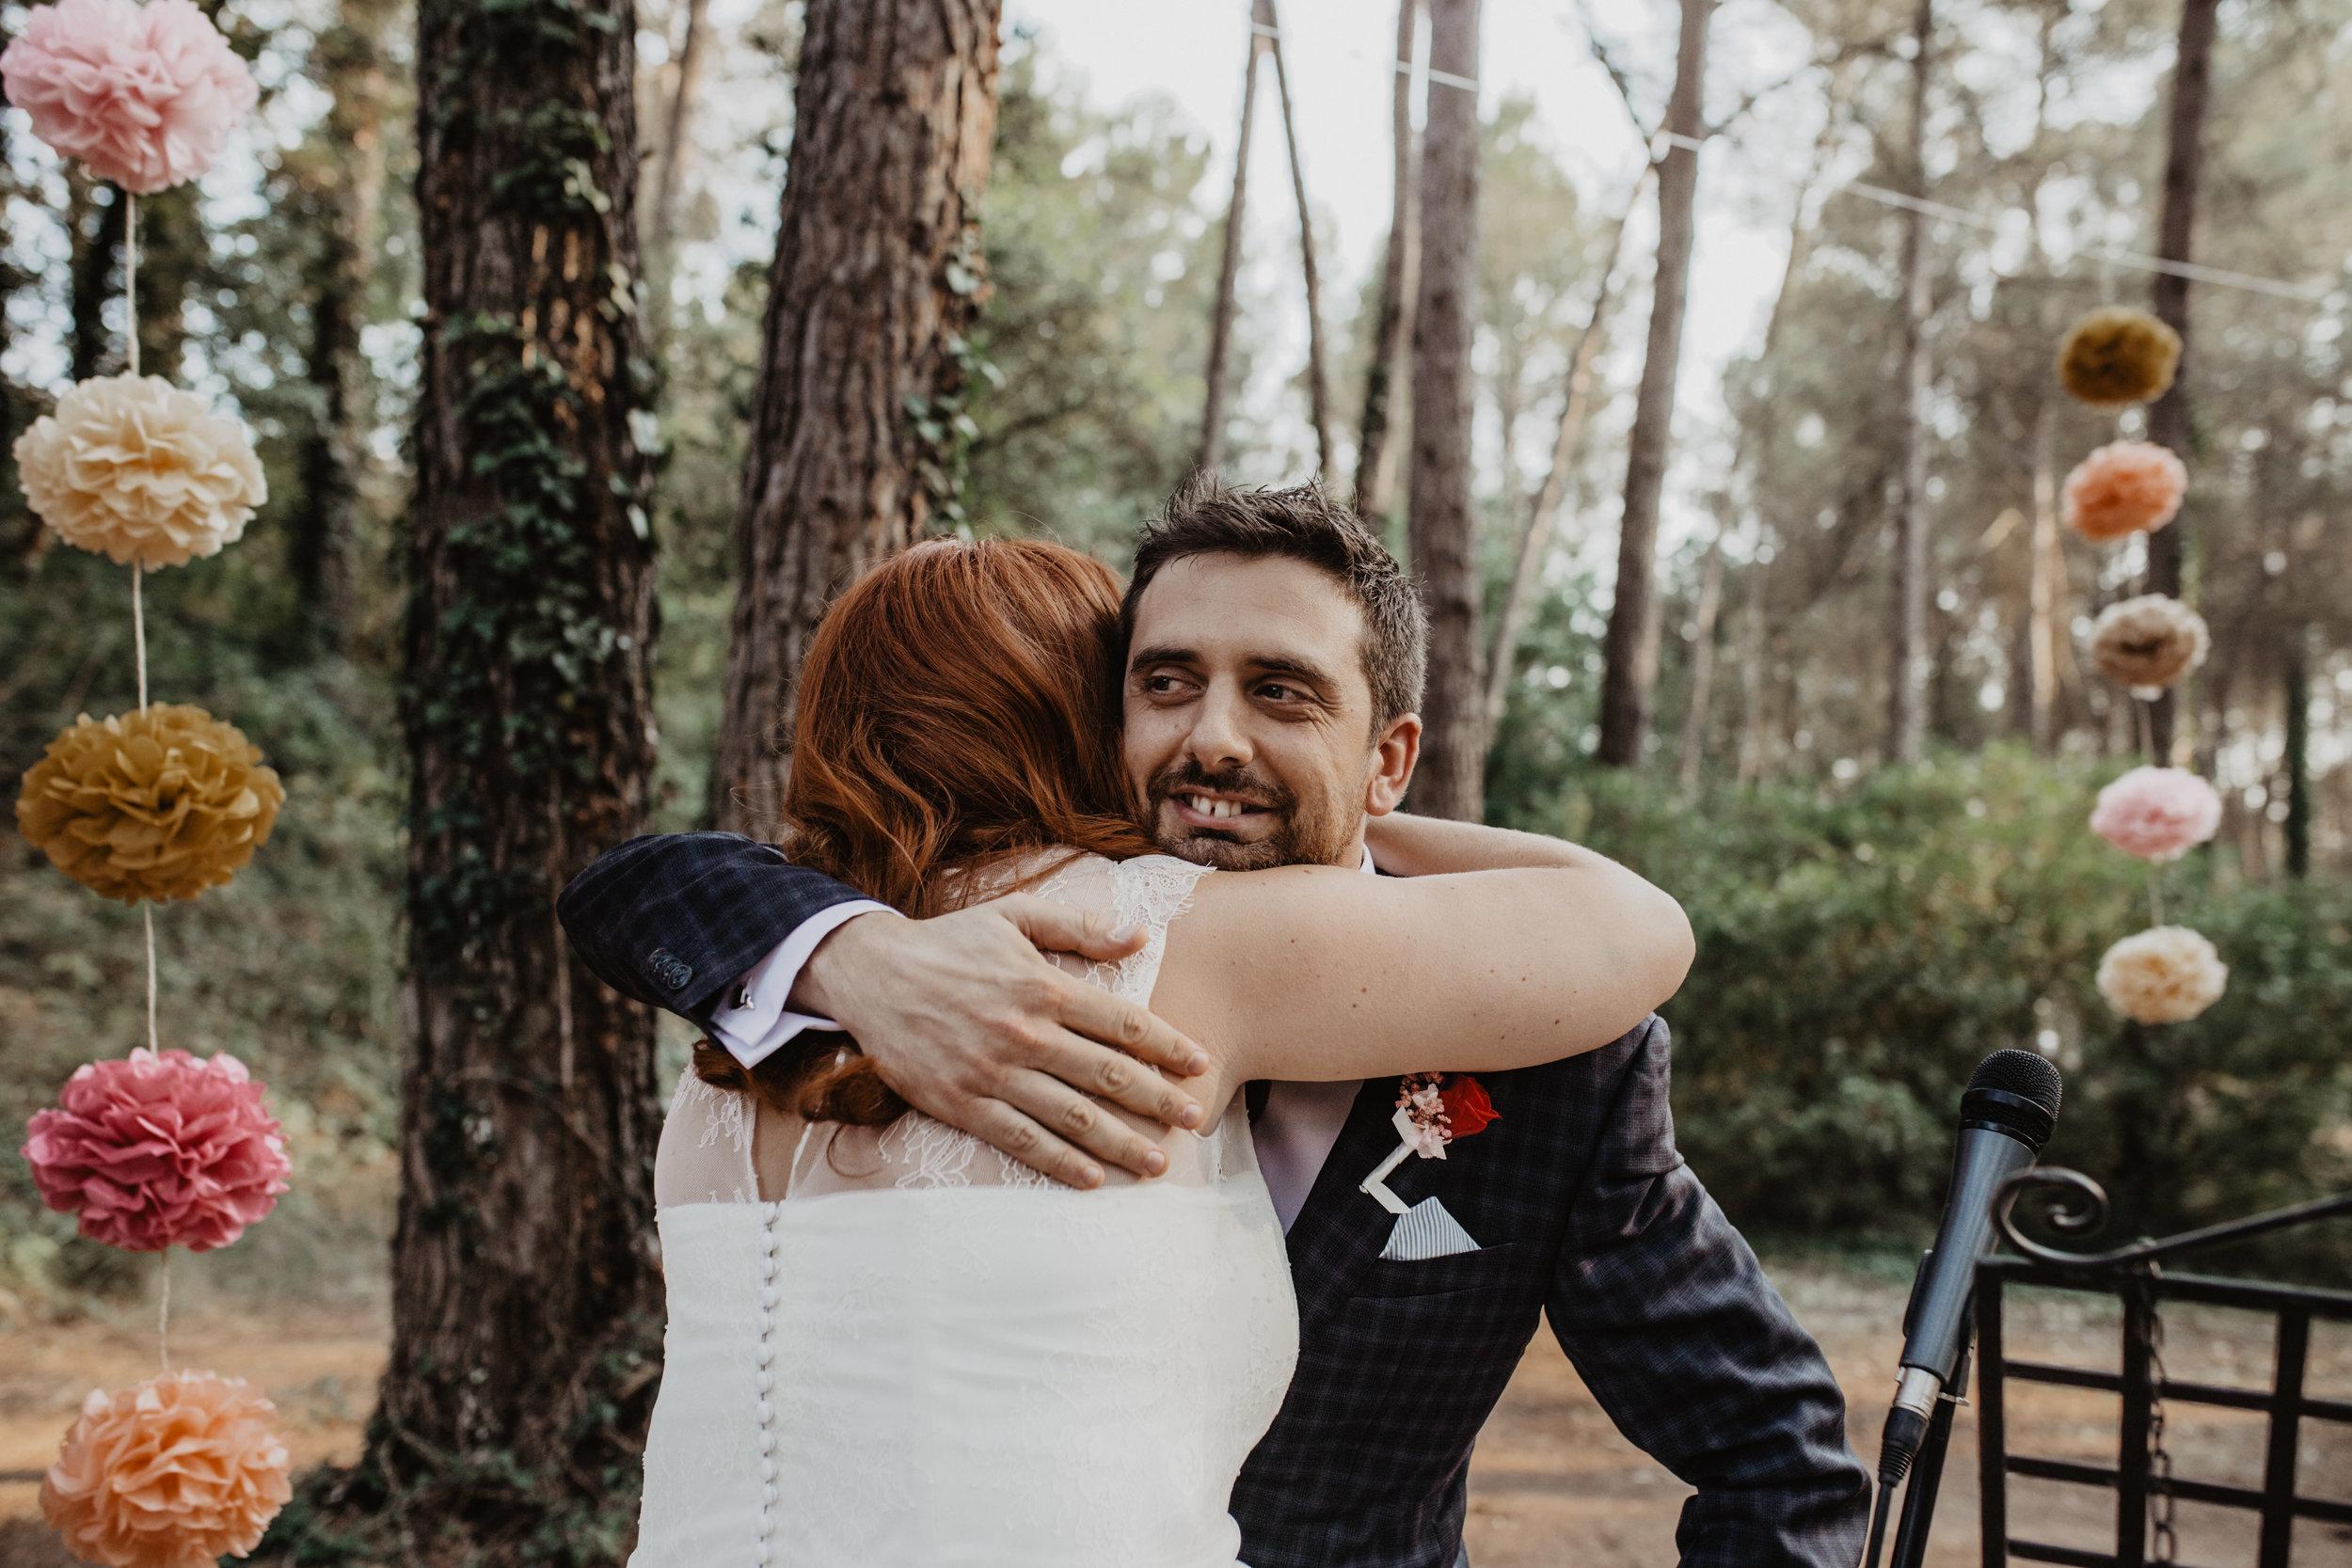 thenortherngirlphotography_photography_thenortherngirl_rebeccascabros_wedding_weddingphotography_masialagarrigadecastelladral_joaniemma_bodaenbarcelona_weddingphotographer_emmaijoan-363.jpg